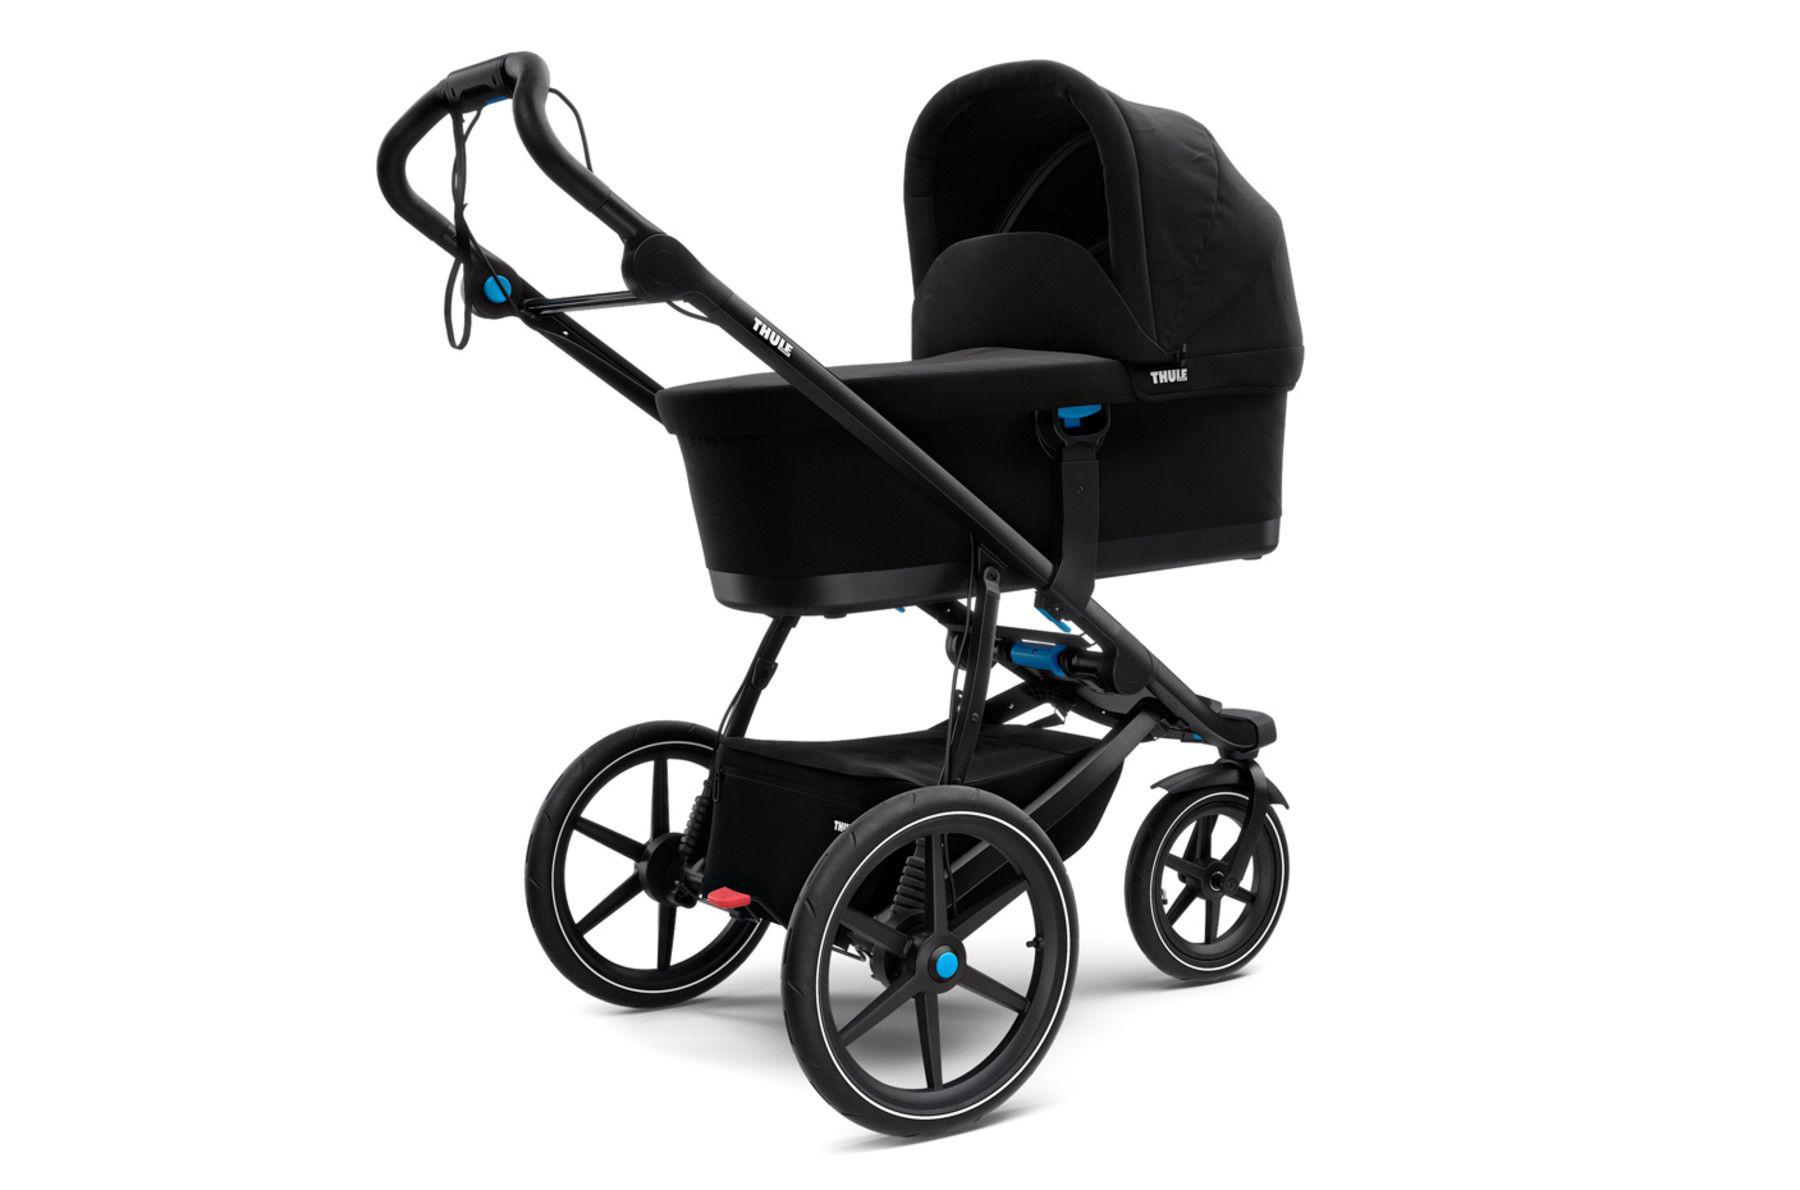 37+ Thule spring stroller canada ideas in 2021